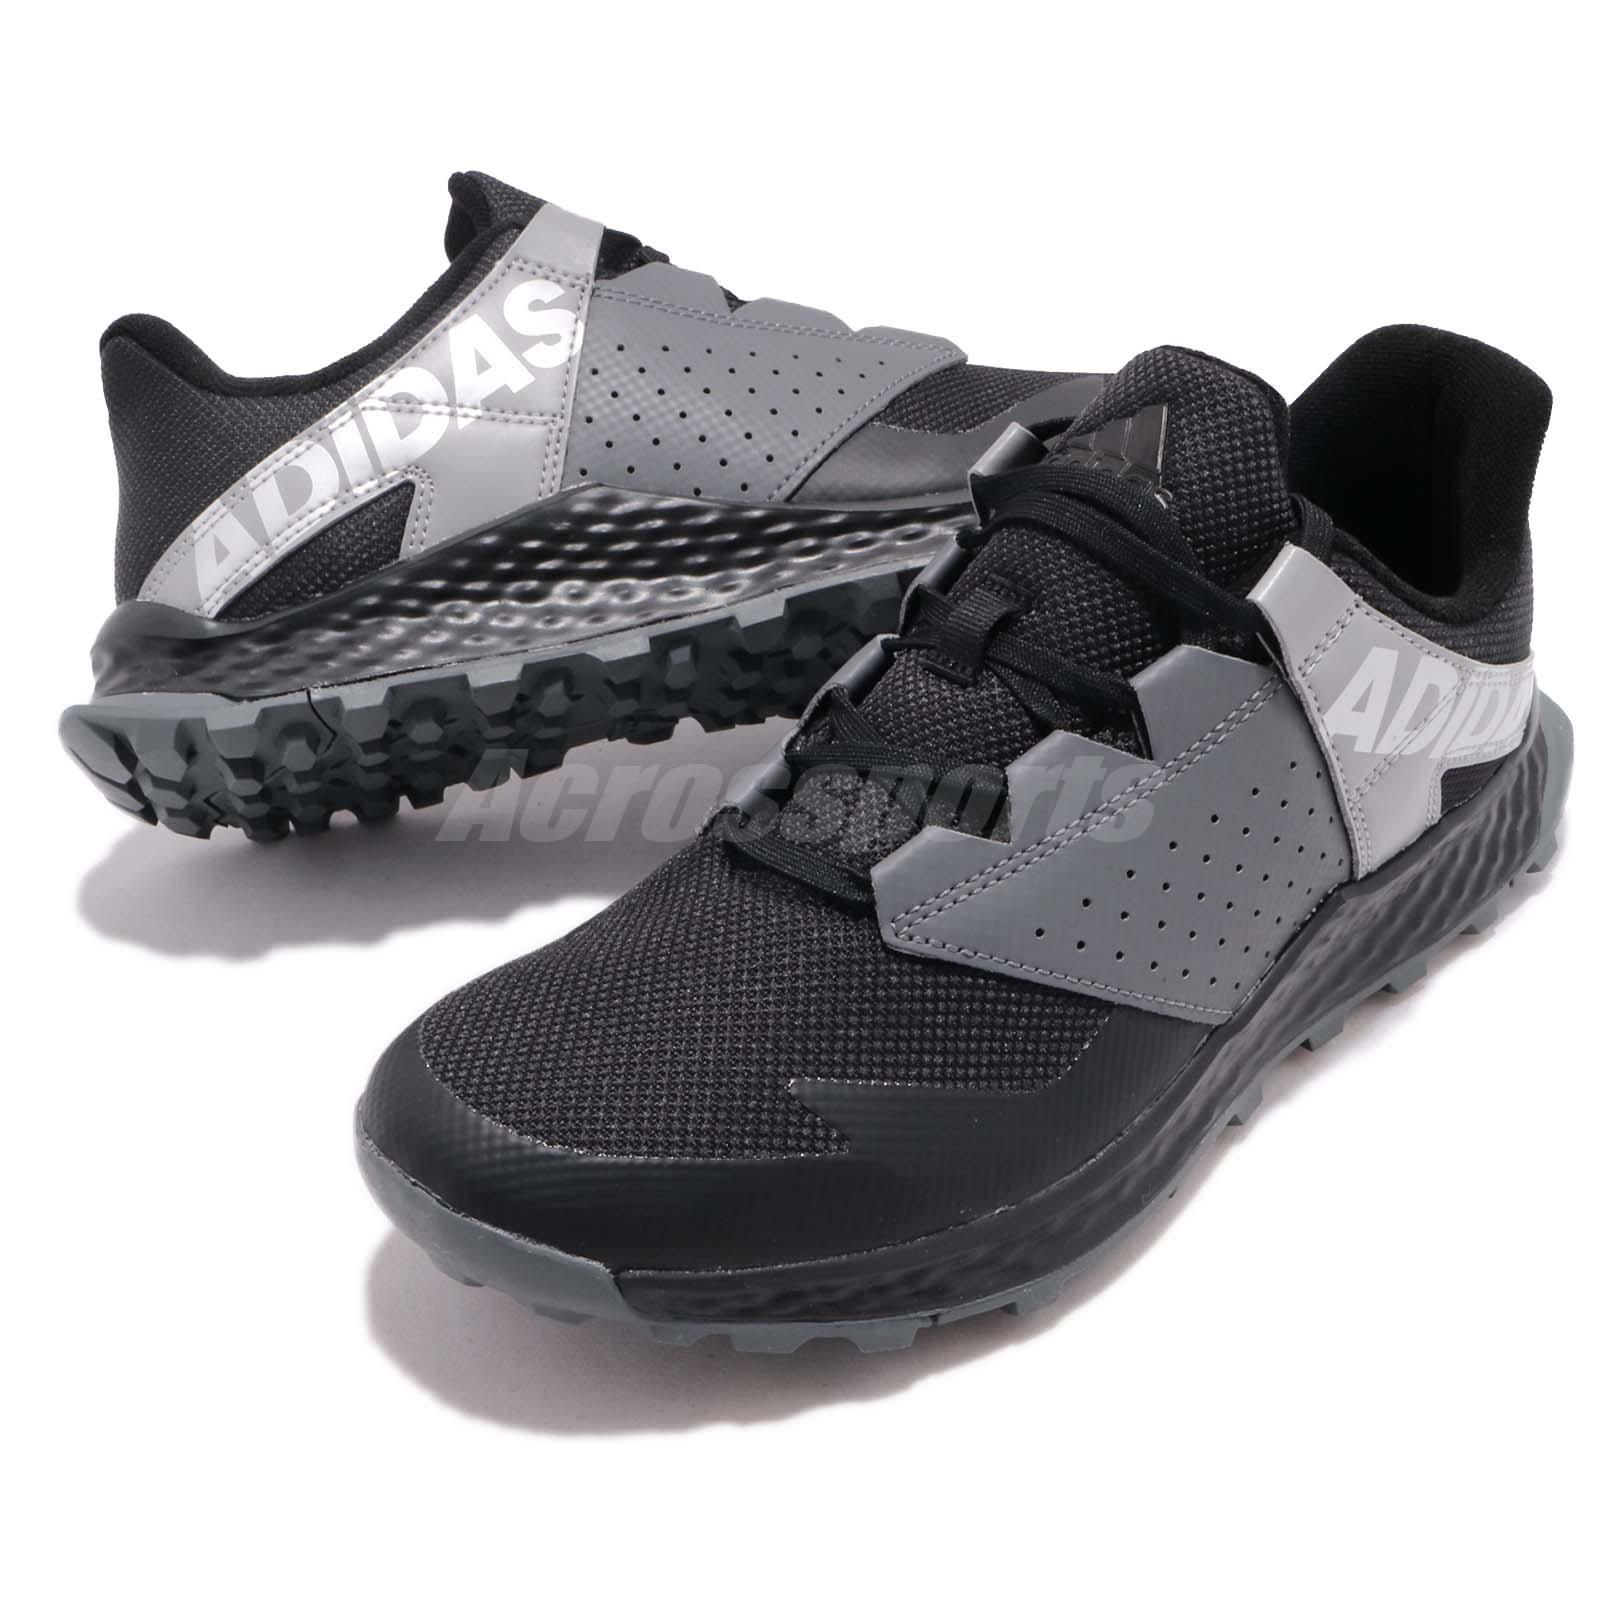 961842c54187b9 adidas Vigor Bounce K Black Grey Kid Junior Preschool Shoes Sneakers ...